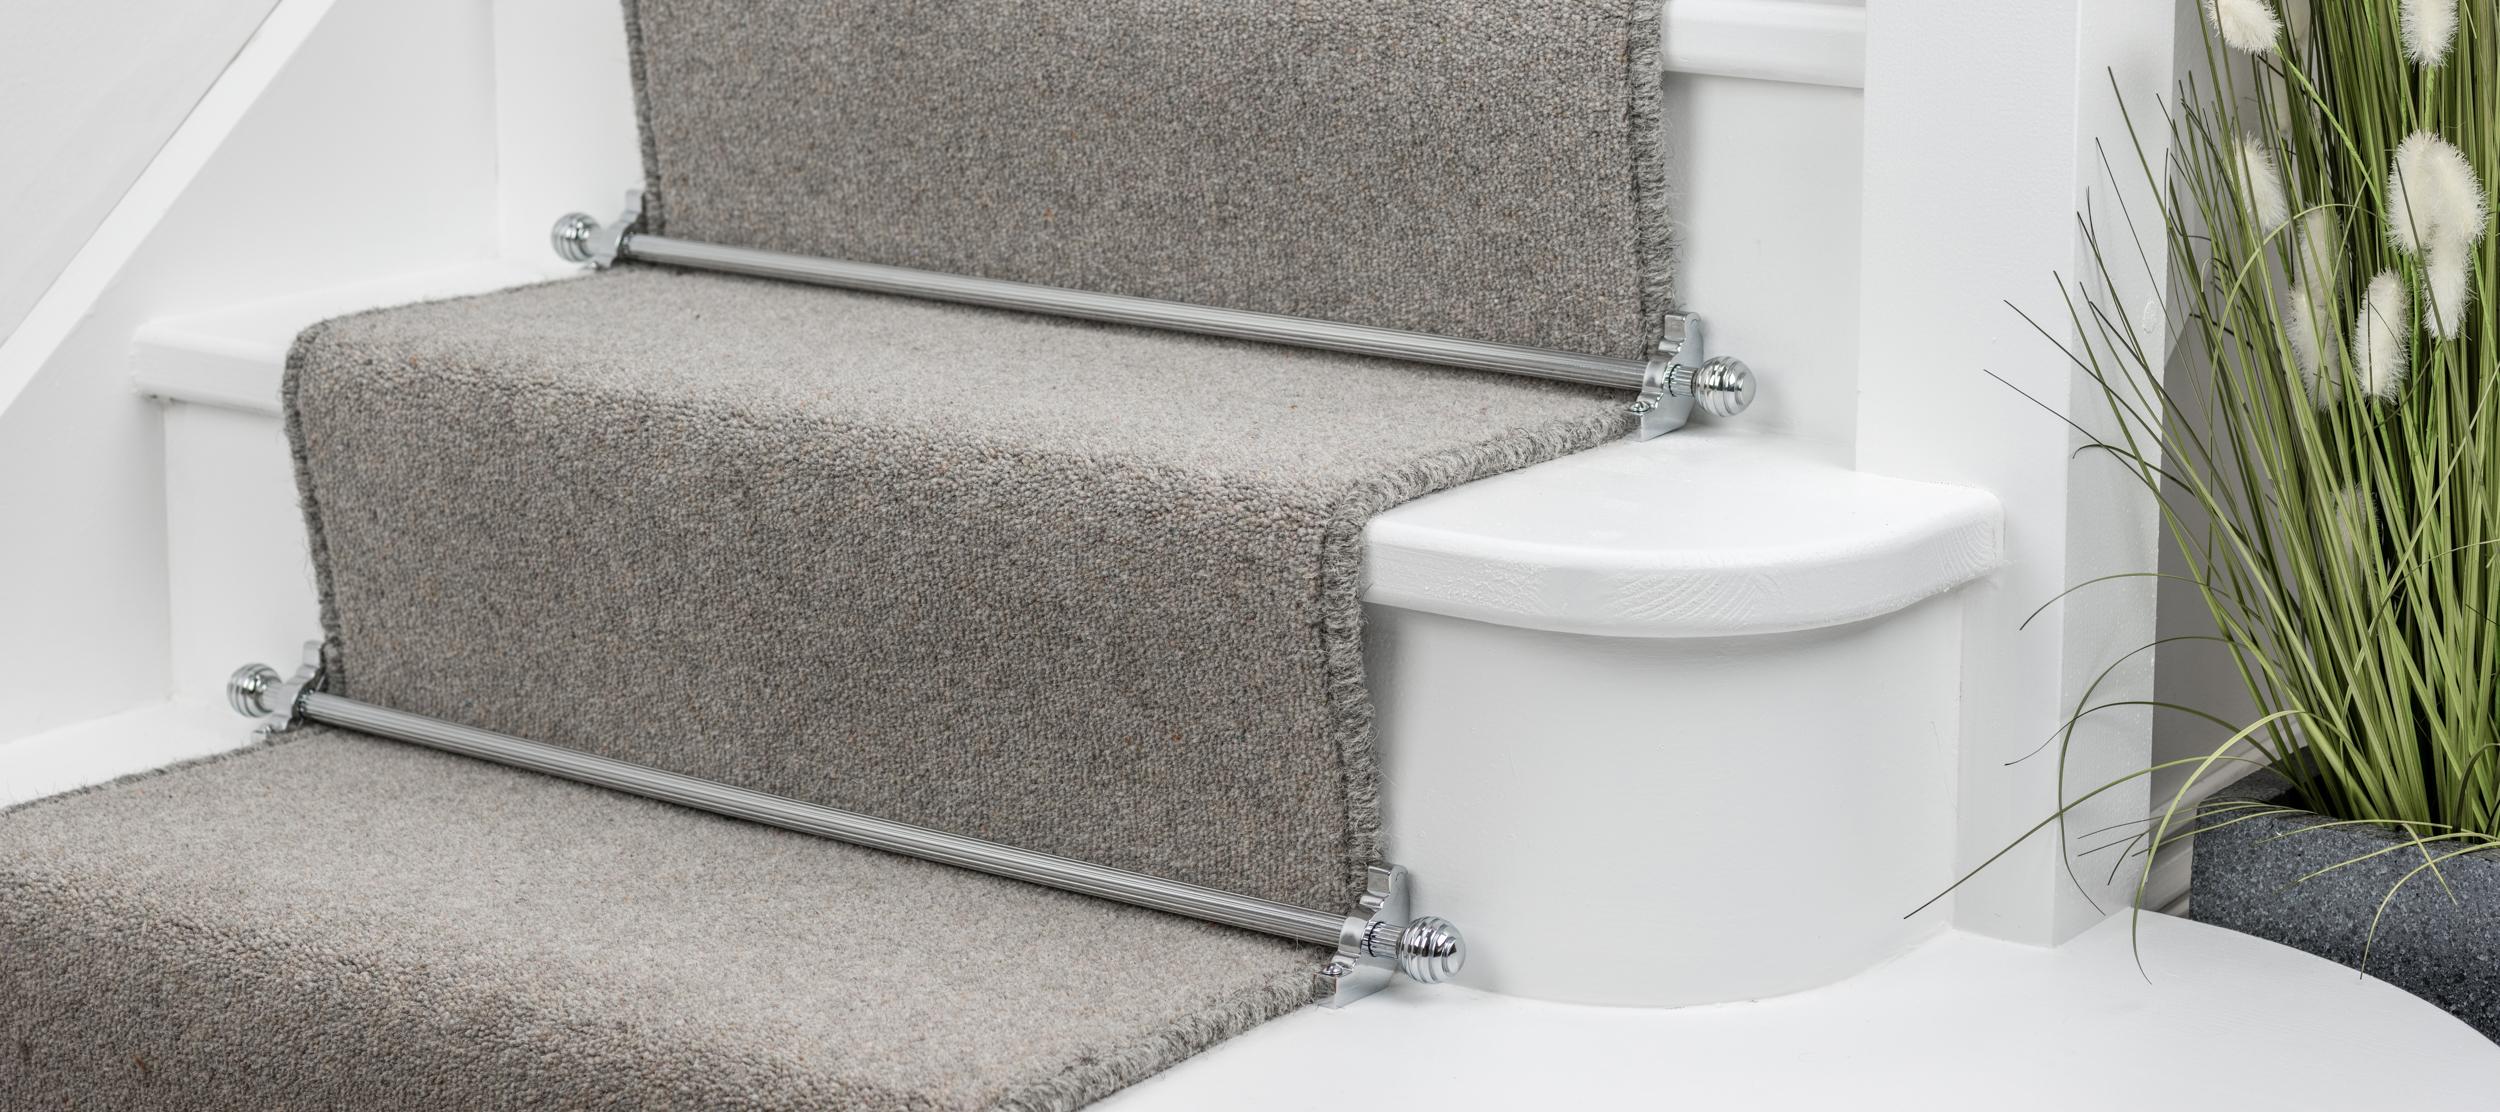 stairrods-brushed-chrome-reeded-sphere.jpg